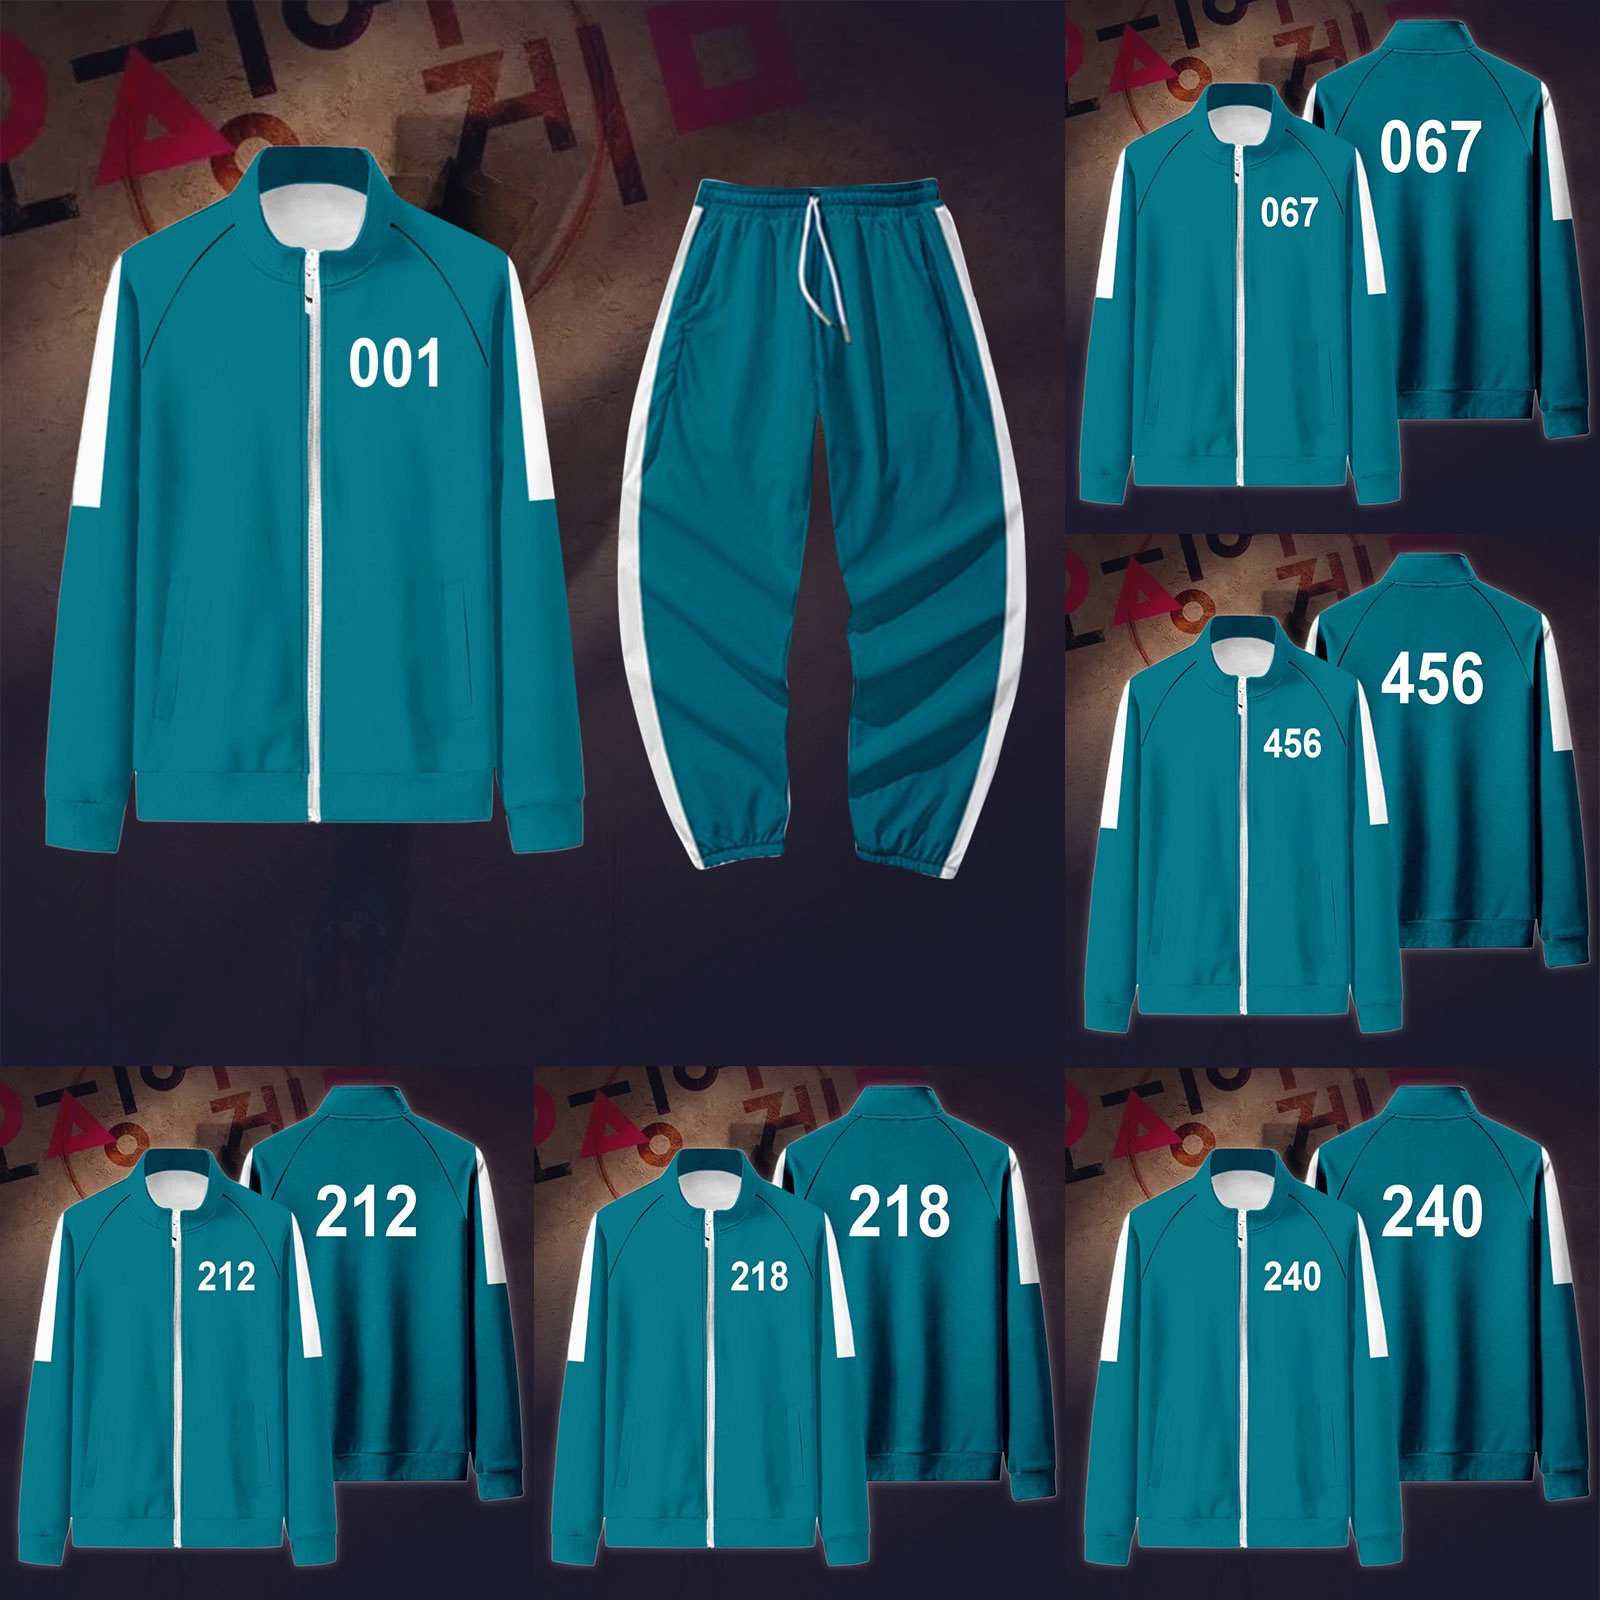 Squid Game Costume Cosplay Coat Sportswear Jacket 456 Digital Sweater 001 Korean Drama Same Clothes Autumn Winter Sports Set